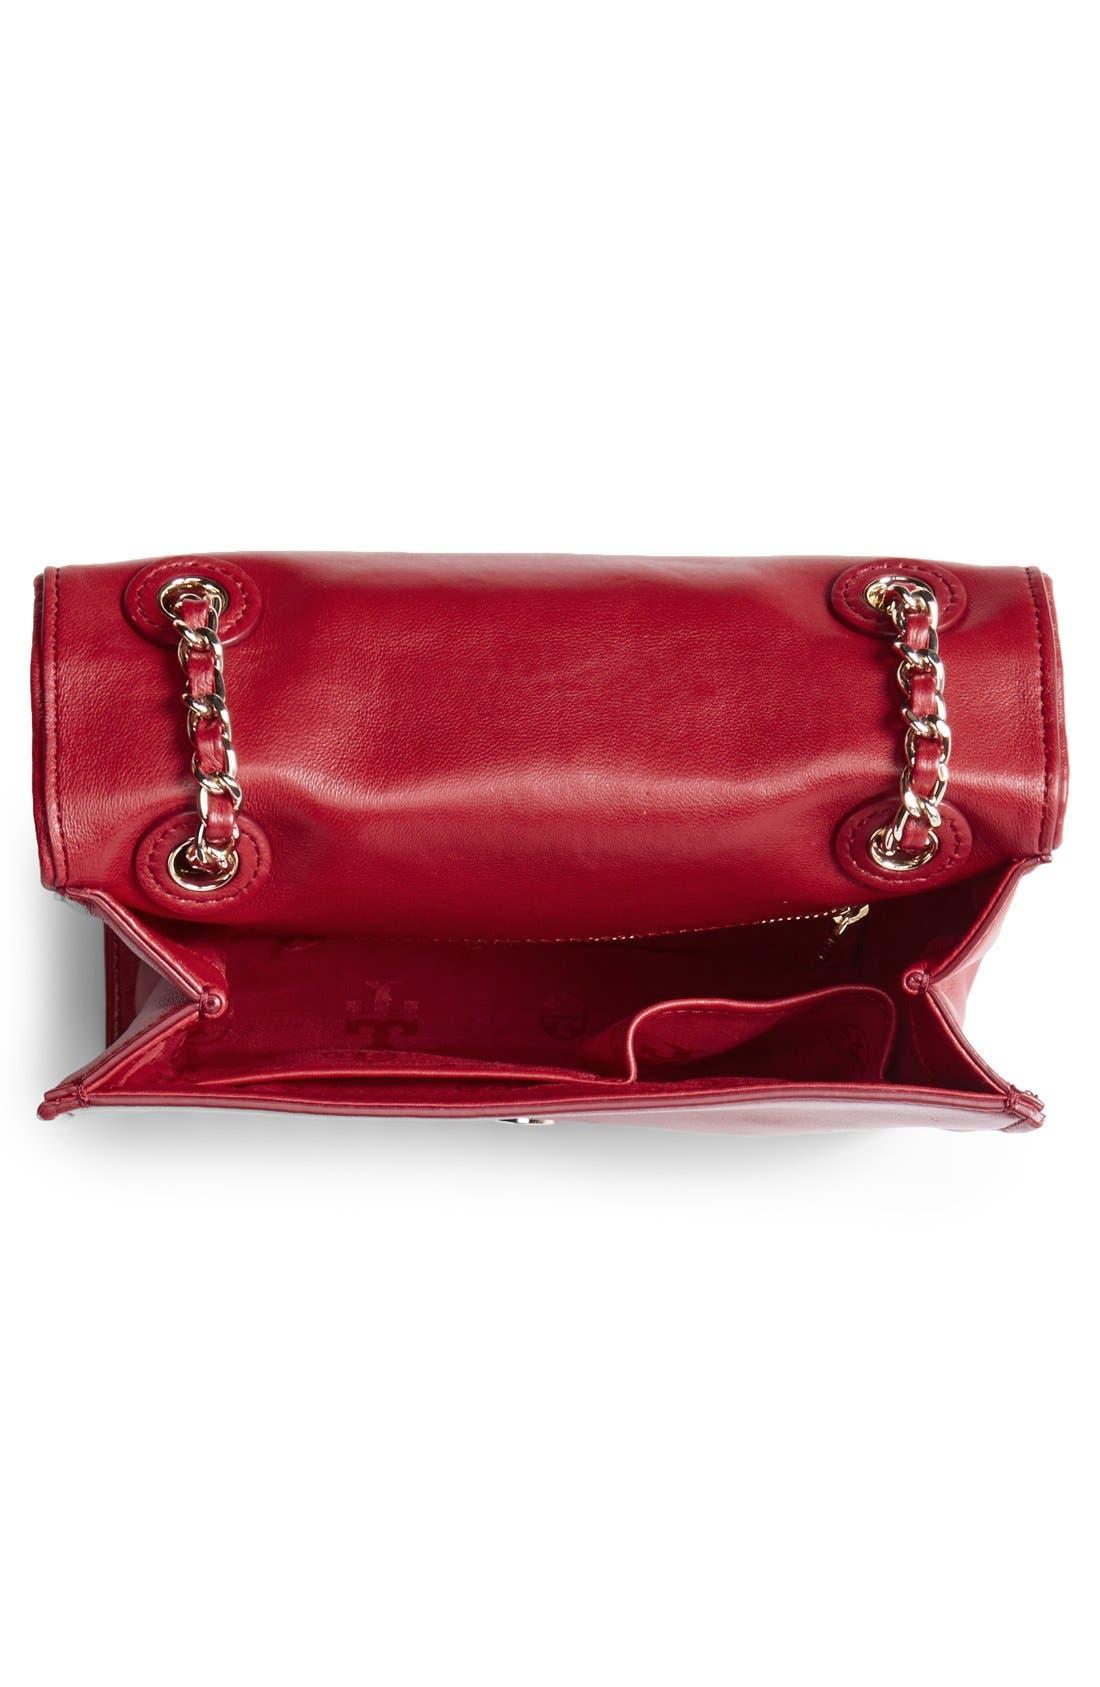 Alternate Image 3  - Tory Burch 'Medium Fleming' Shoulder Bag